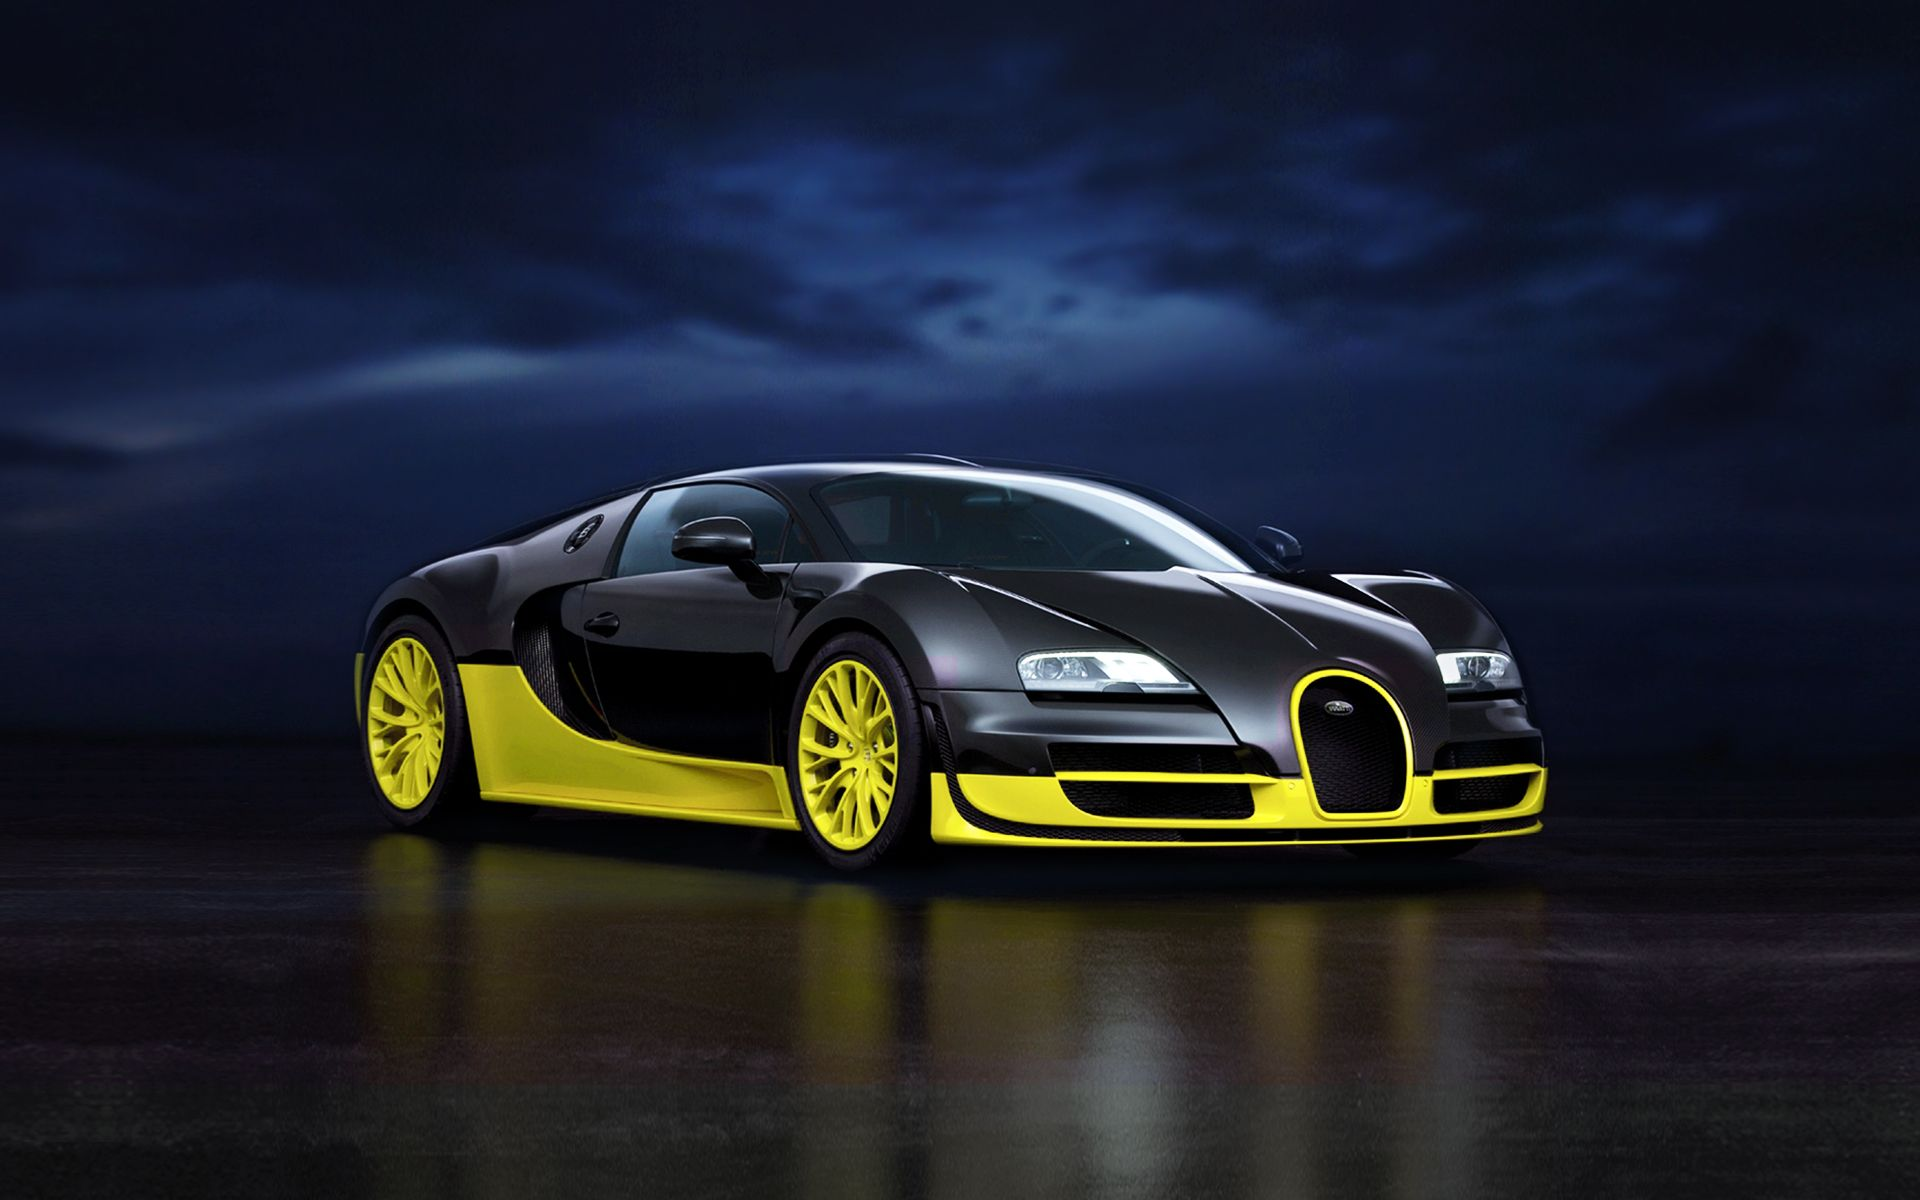 1b1a4862e15fb73b3bdc07ae7da2e7cc Terrific Bugatti Veyron 16.4 Grand Sport Vitesse Prix Cars Trend